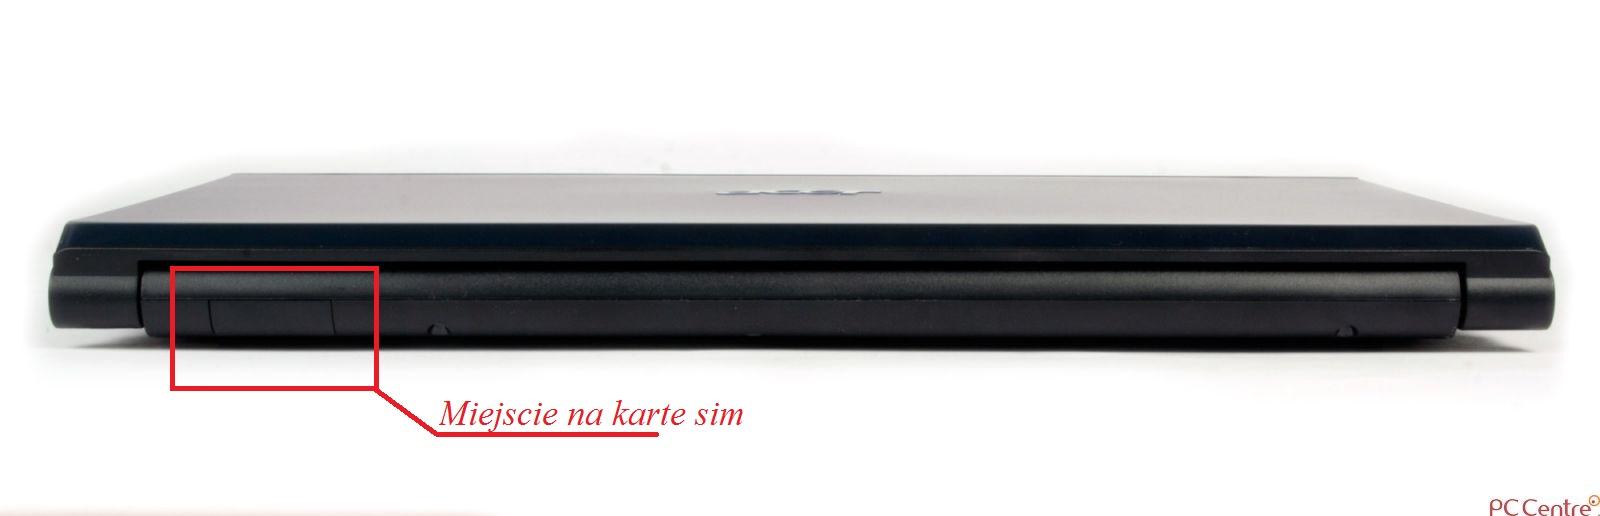 acer aspire 5830tg - modu� 3G w acer aspire 5830tg